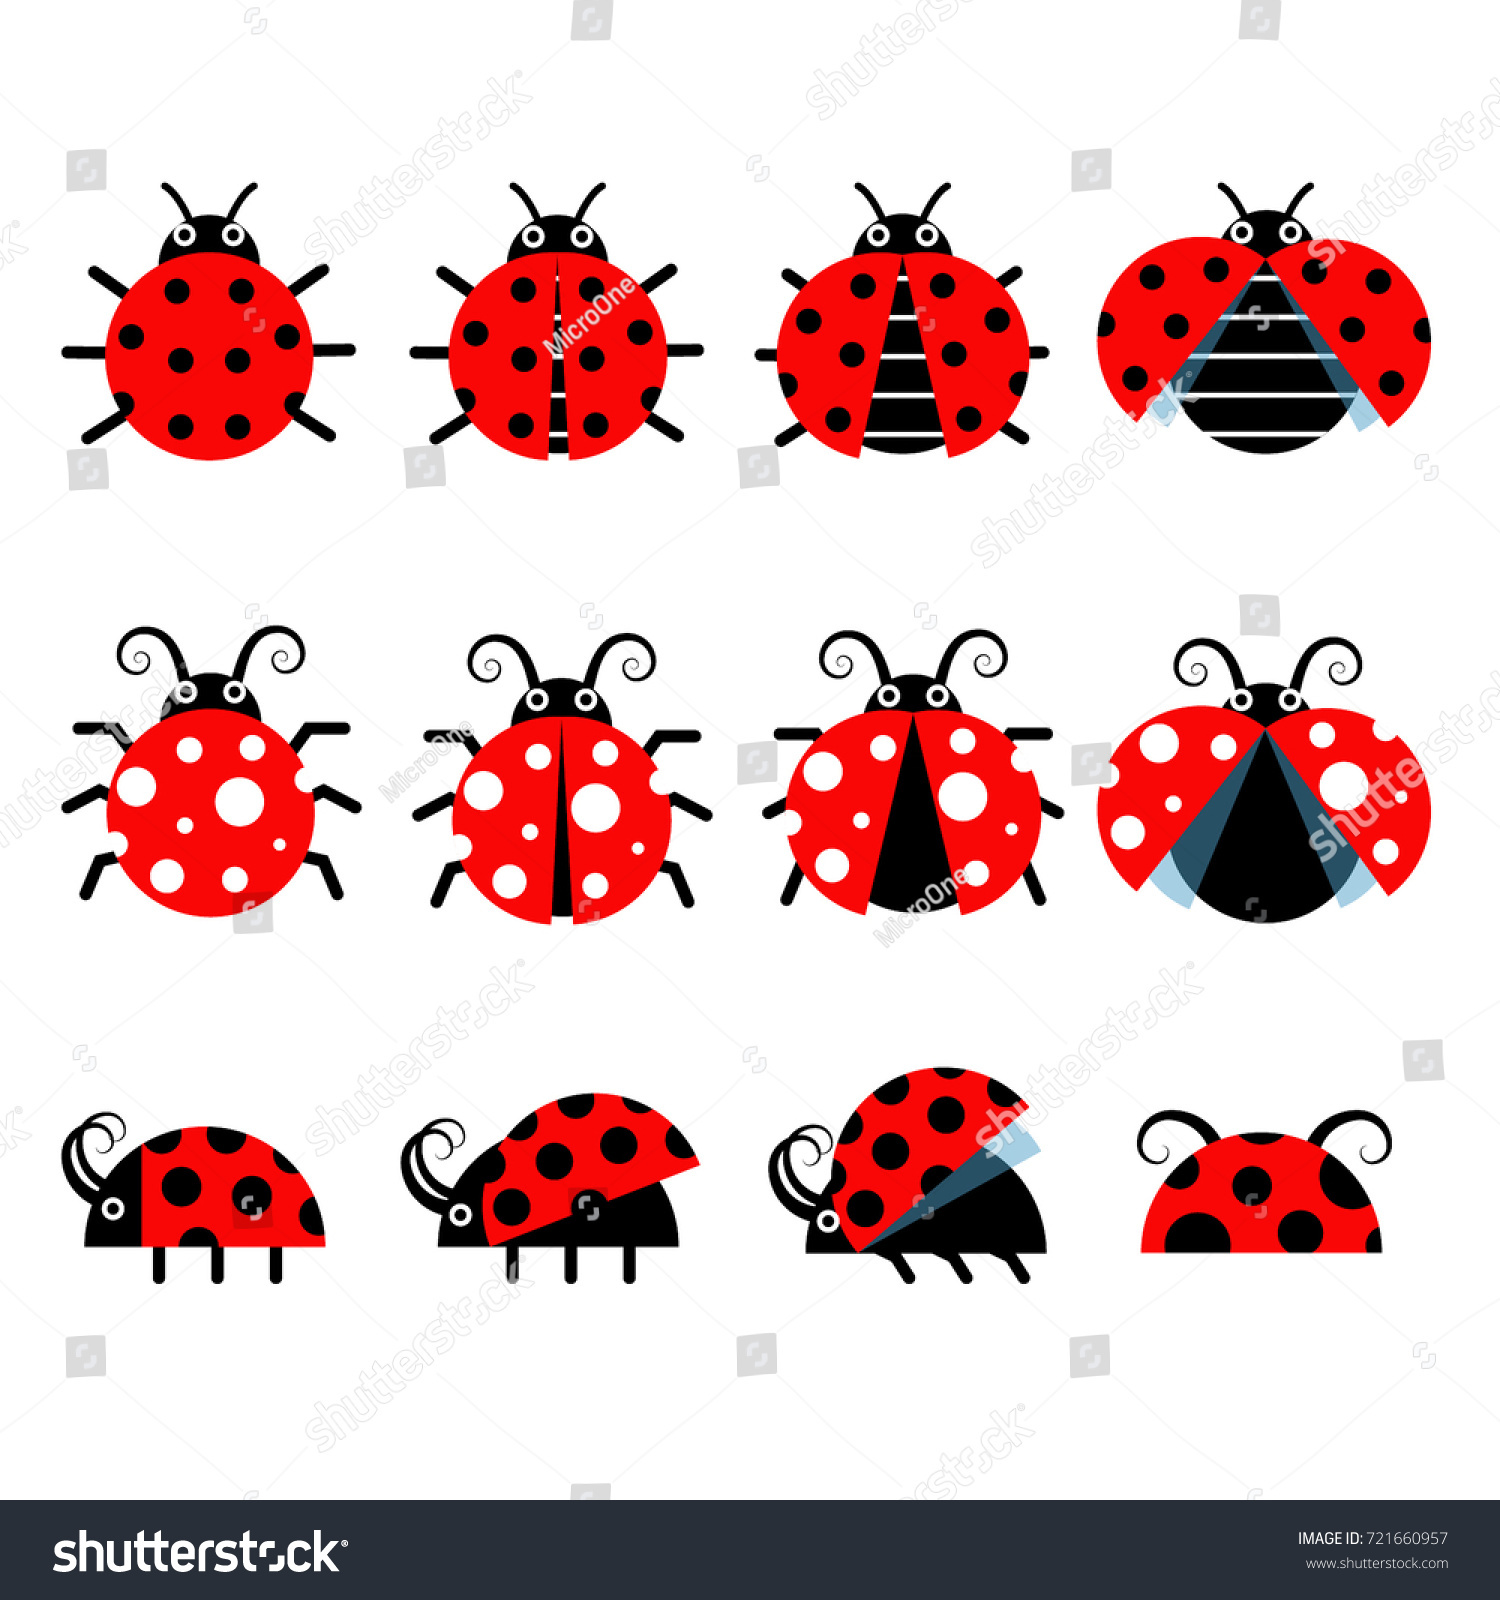 cute ladybug vector icons cartoonstyle bug stock vector 721660957